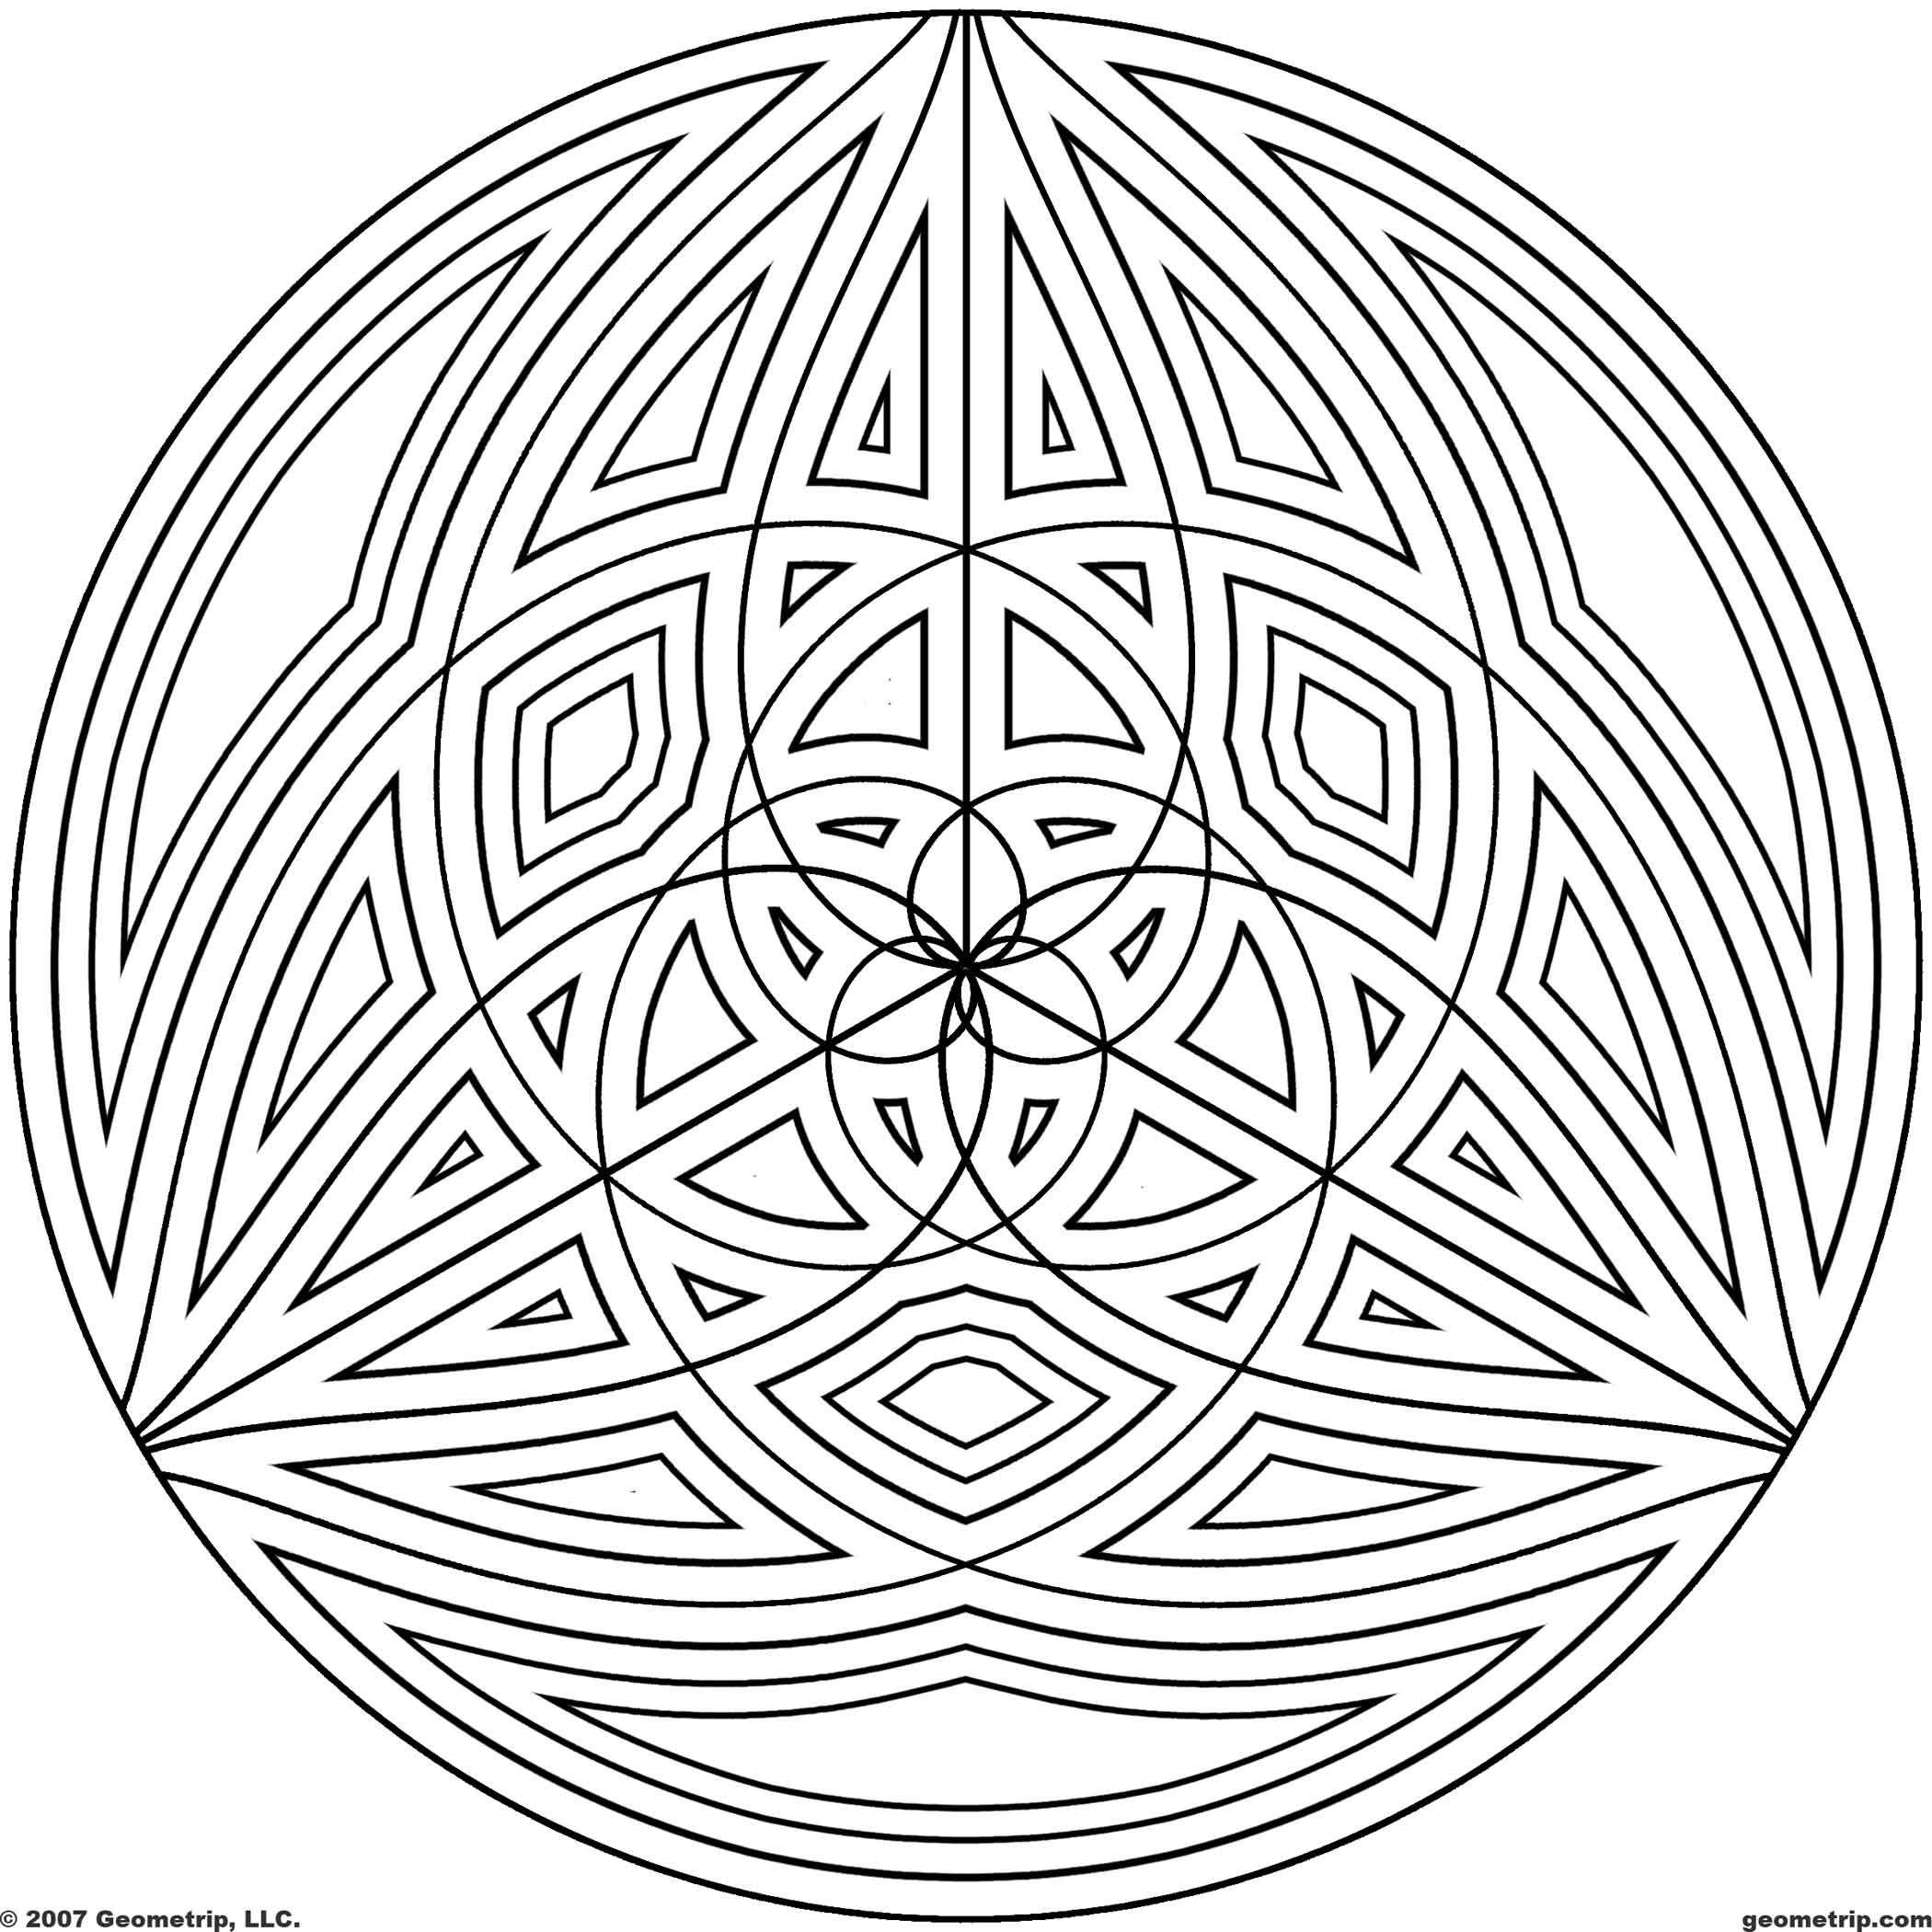 Geometrip Com Free Geometric Coloring Designs Circles Geometric Coloring Pages Cool Coloring Pages Mandala Coloring Pages